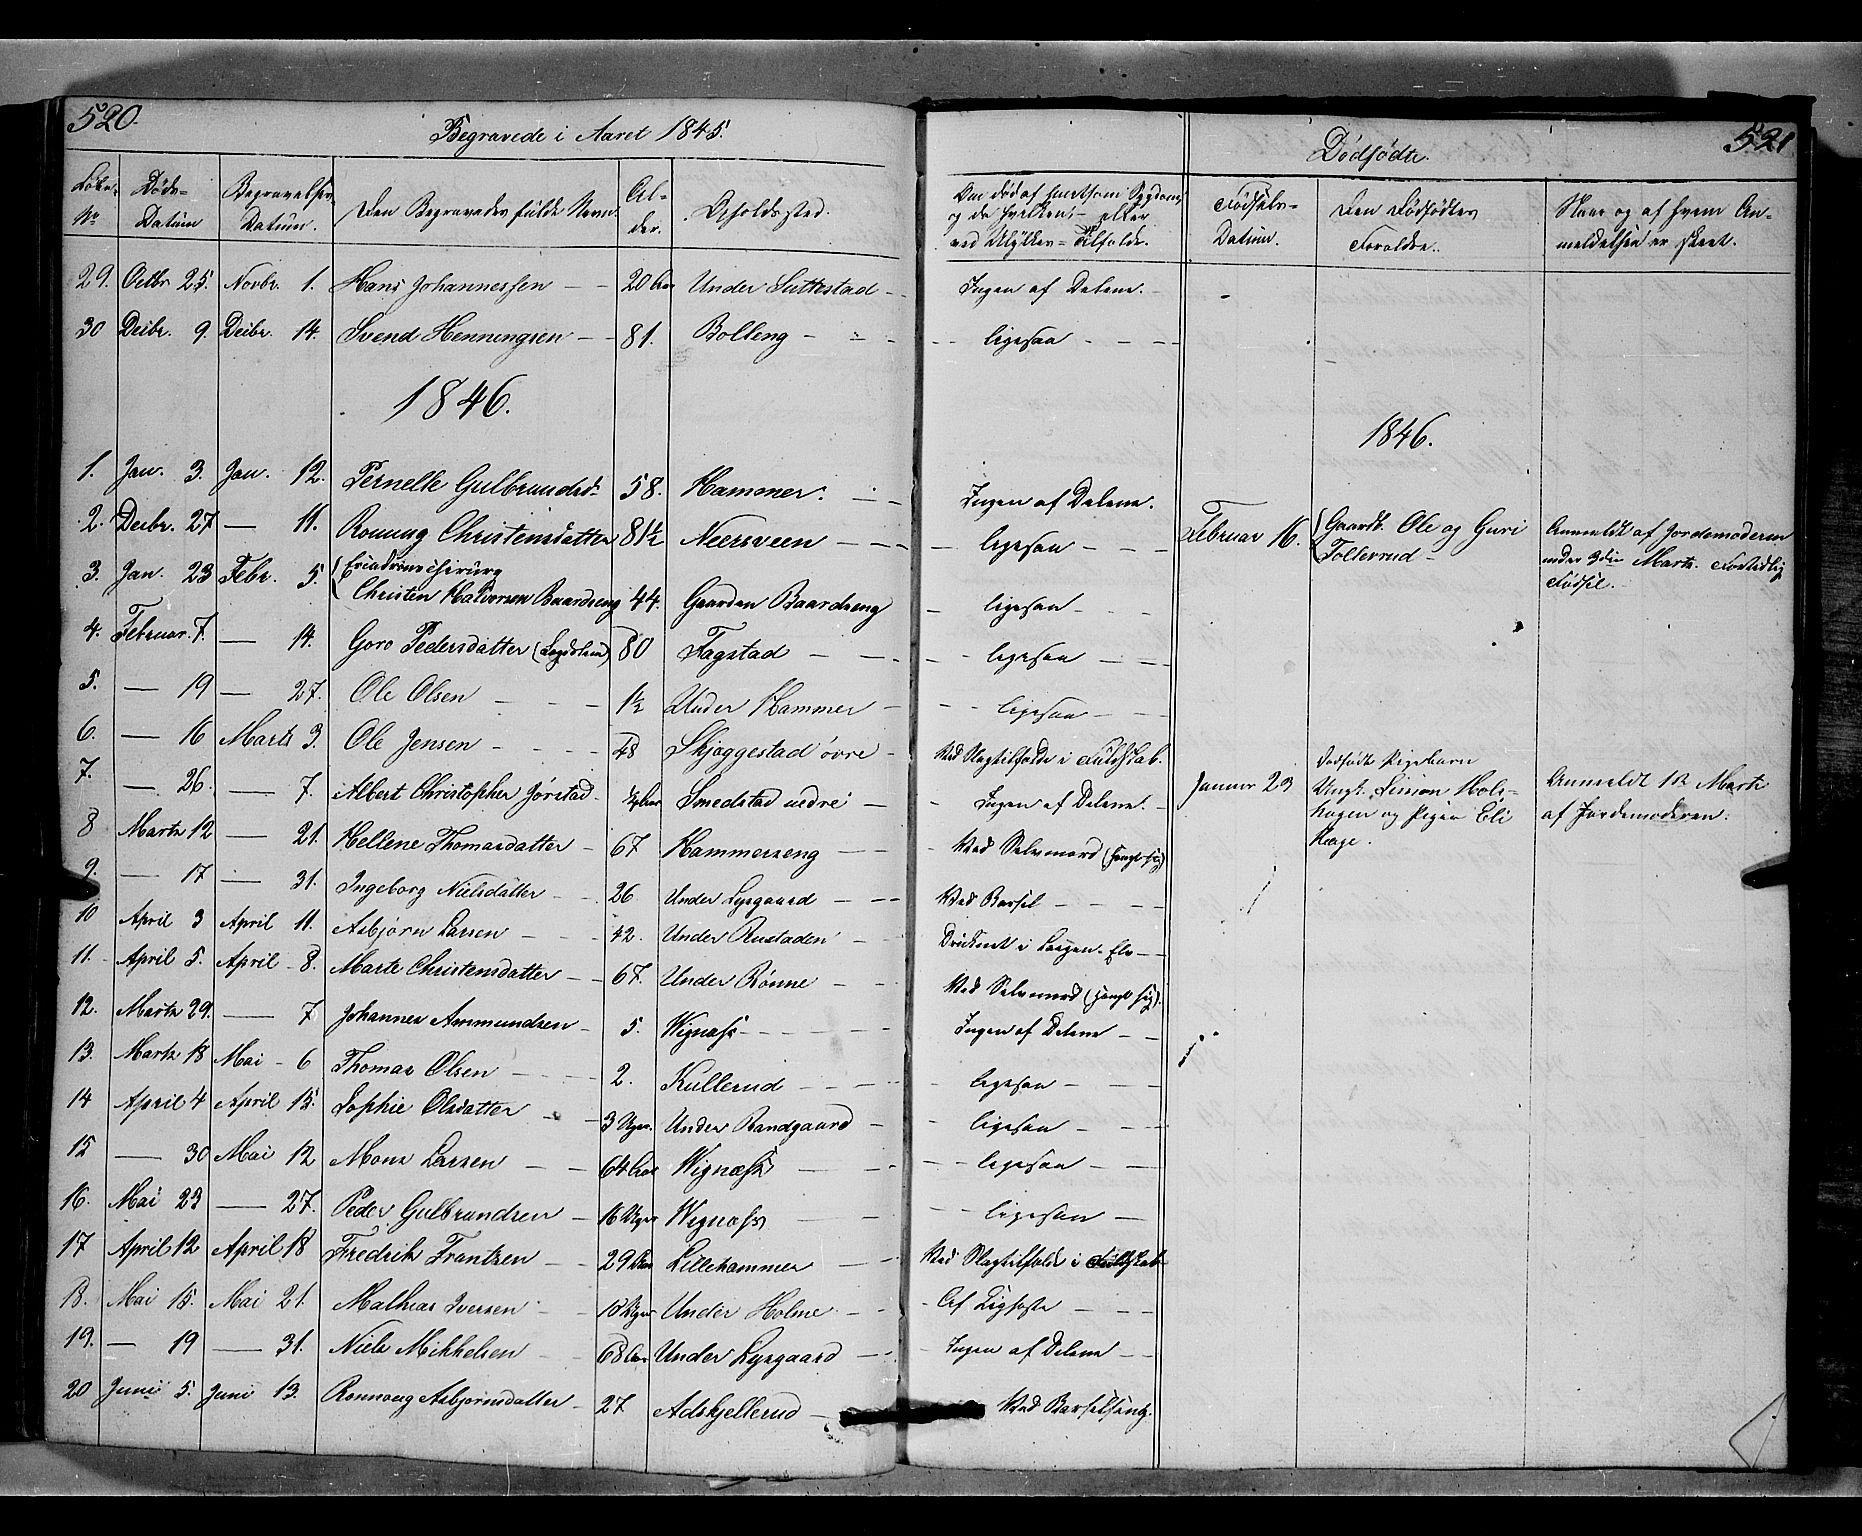 SAH, Fåberg prestekontor, Klokkerbok nr. 6, 1837-1855, s. 520-521